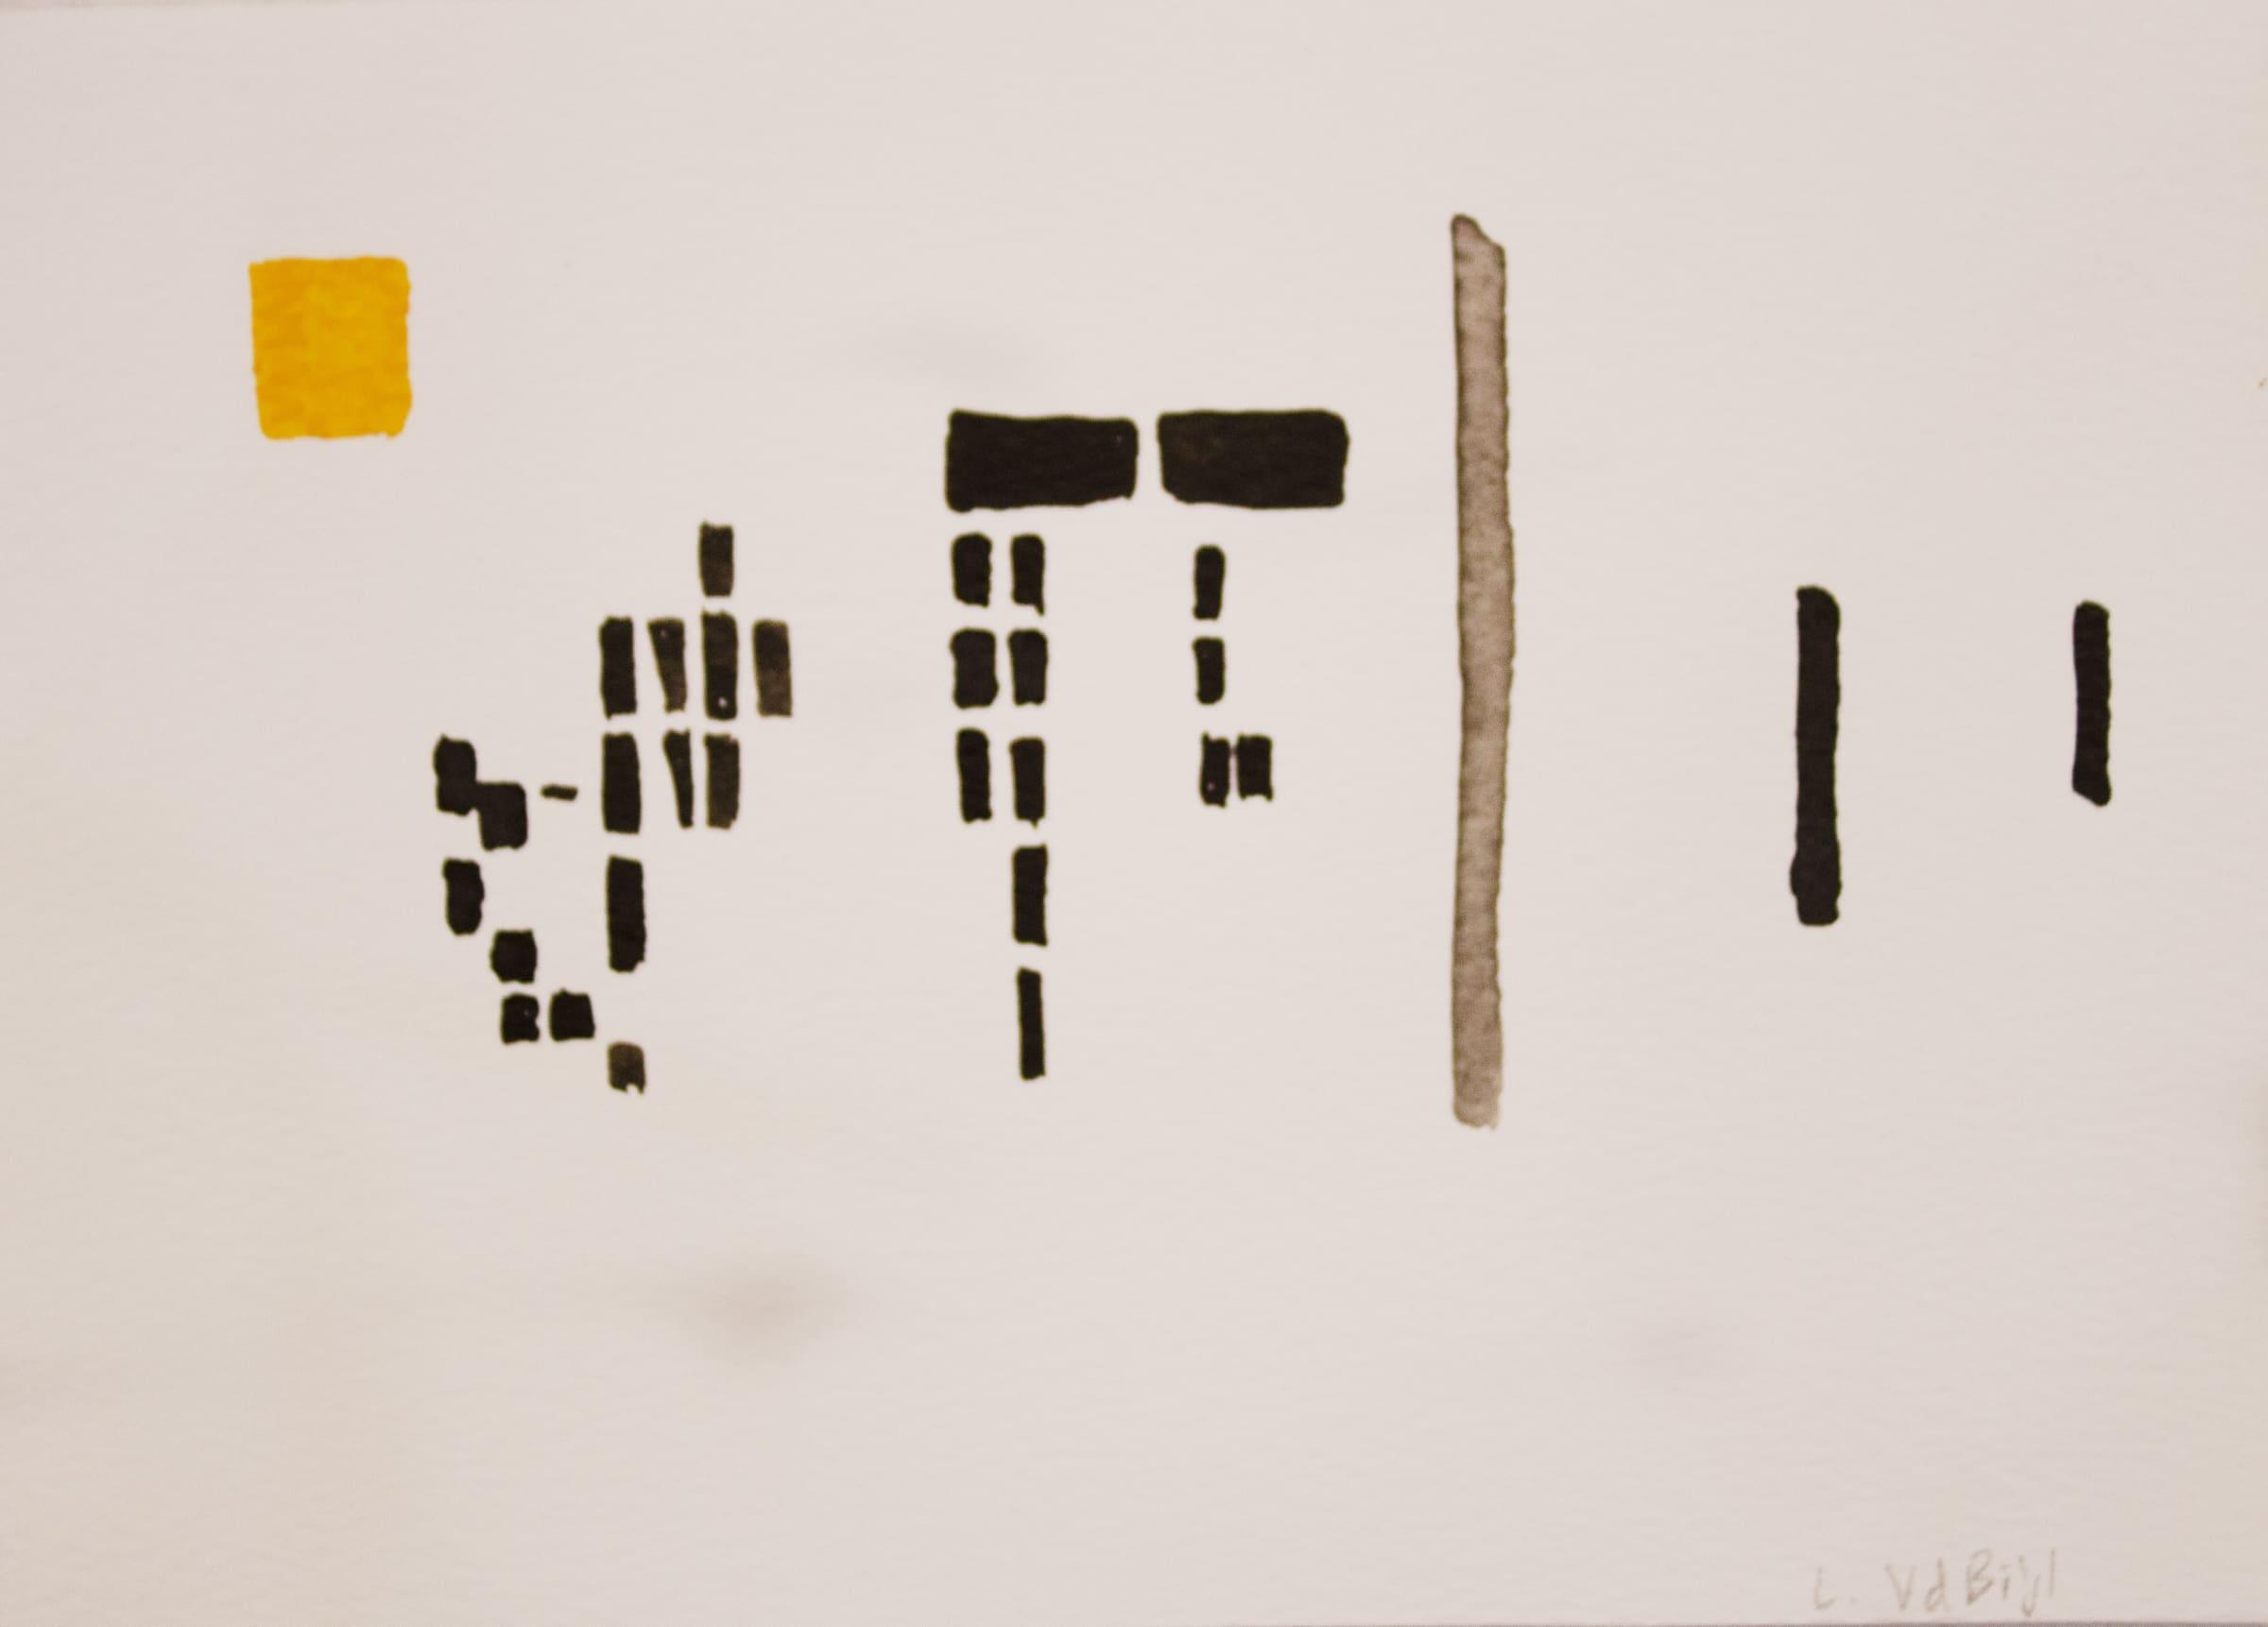 <span class=&#34;link fancybox-details-link&#34;><a href=&#34;/artists/88-louise-van-der-bijl/works/2276-louise-van-der-bijl-inktober-day-14-2018/&#34;>View Detail Page</a></span><div class=&#34;artist&#34;><strong>Louise Van Der Bijl</strong></div> <div class=&#34;title&#34;><em>Inktober Day 14</em>, 2018</div> <div class=&#34;medium&#34;>Ink On Paper</div> <div class=&#34;dimensions&#34;>15cm x 20.9cm</div><div class=&#34;price&#34;>R400.00</div>